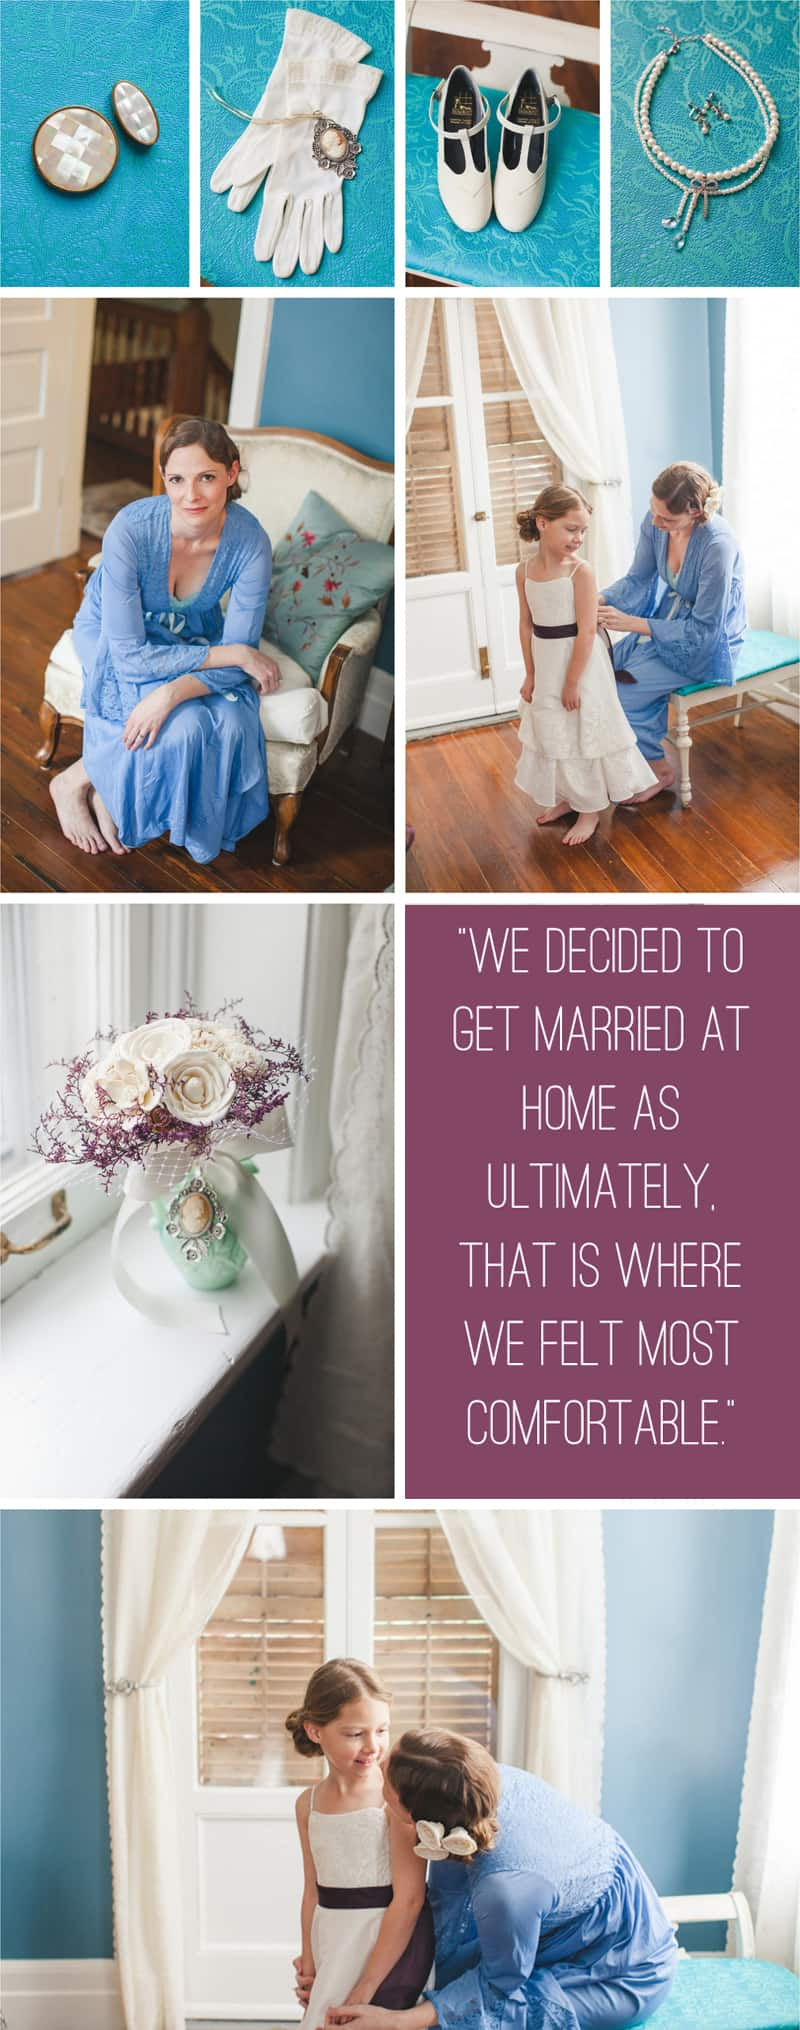 A Purple Wedding Dress For a Backyard Wedding 2